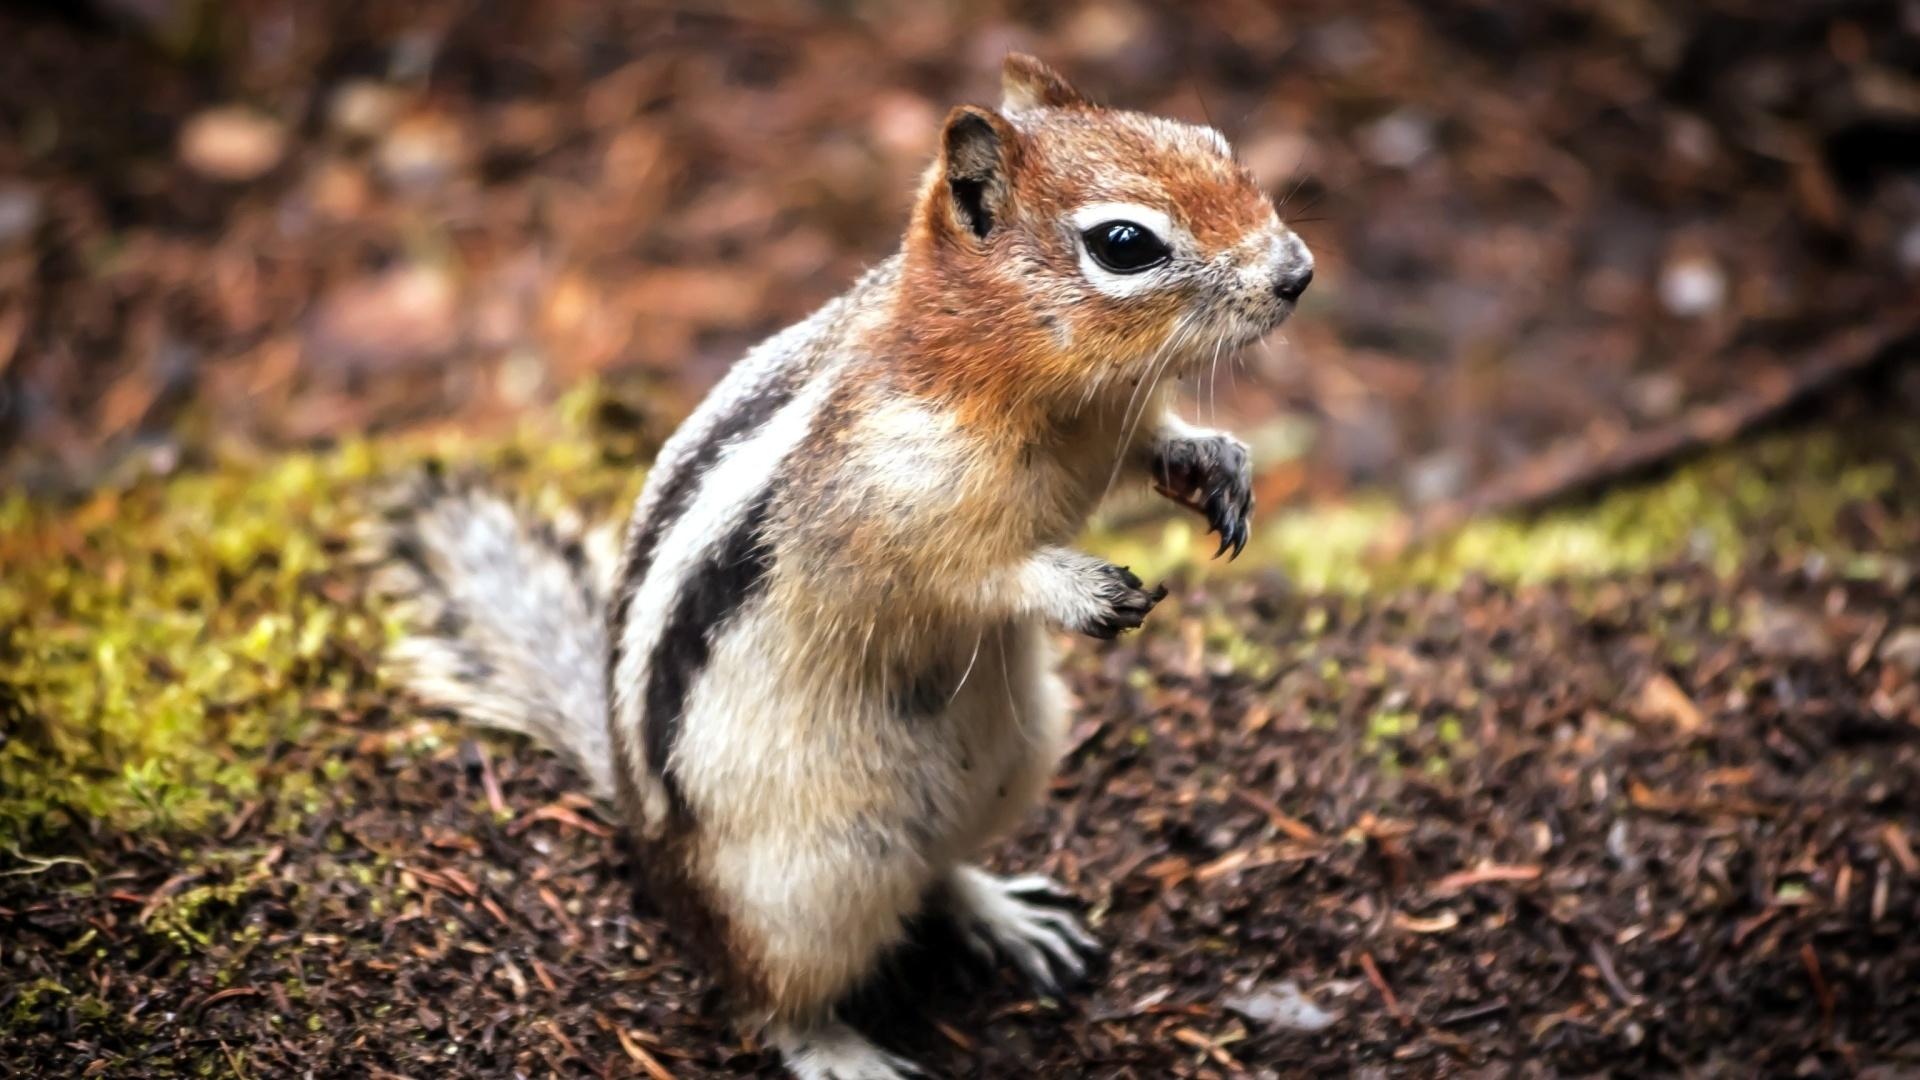 Chipmunk Picture